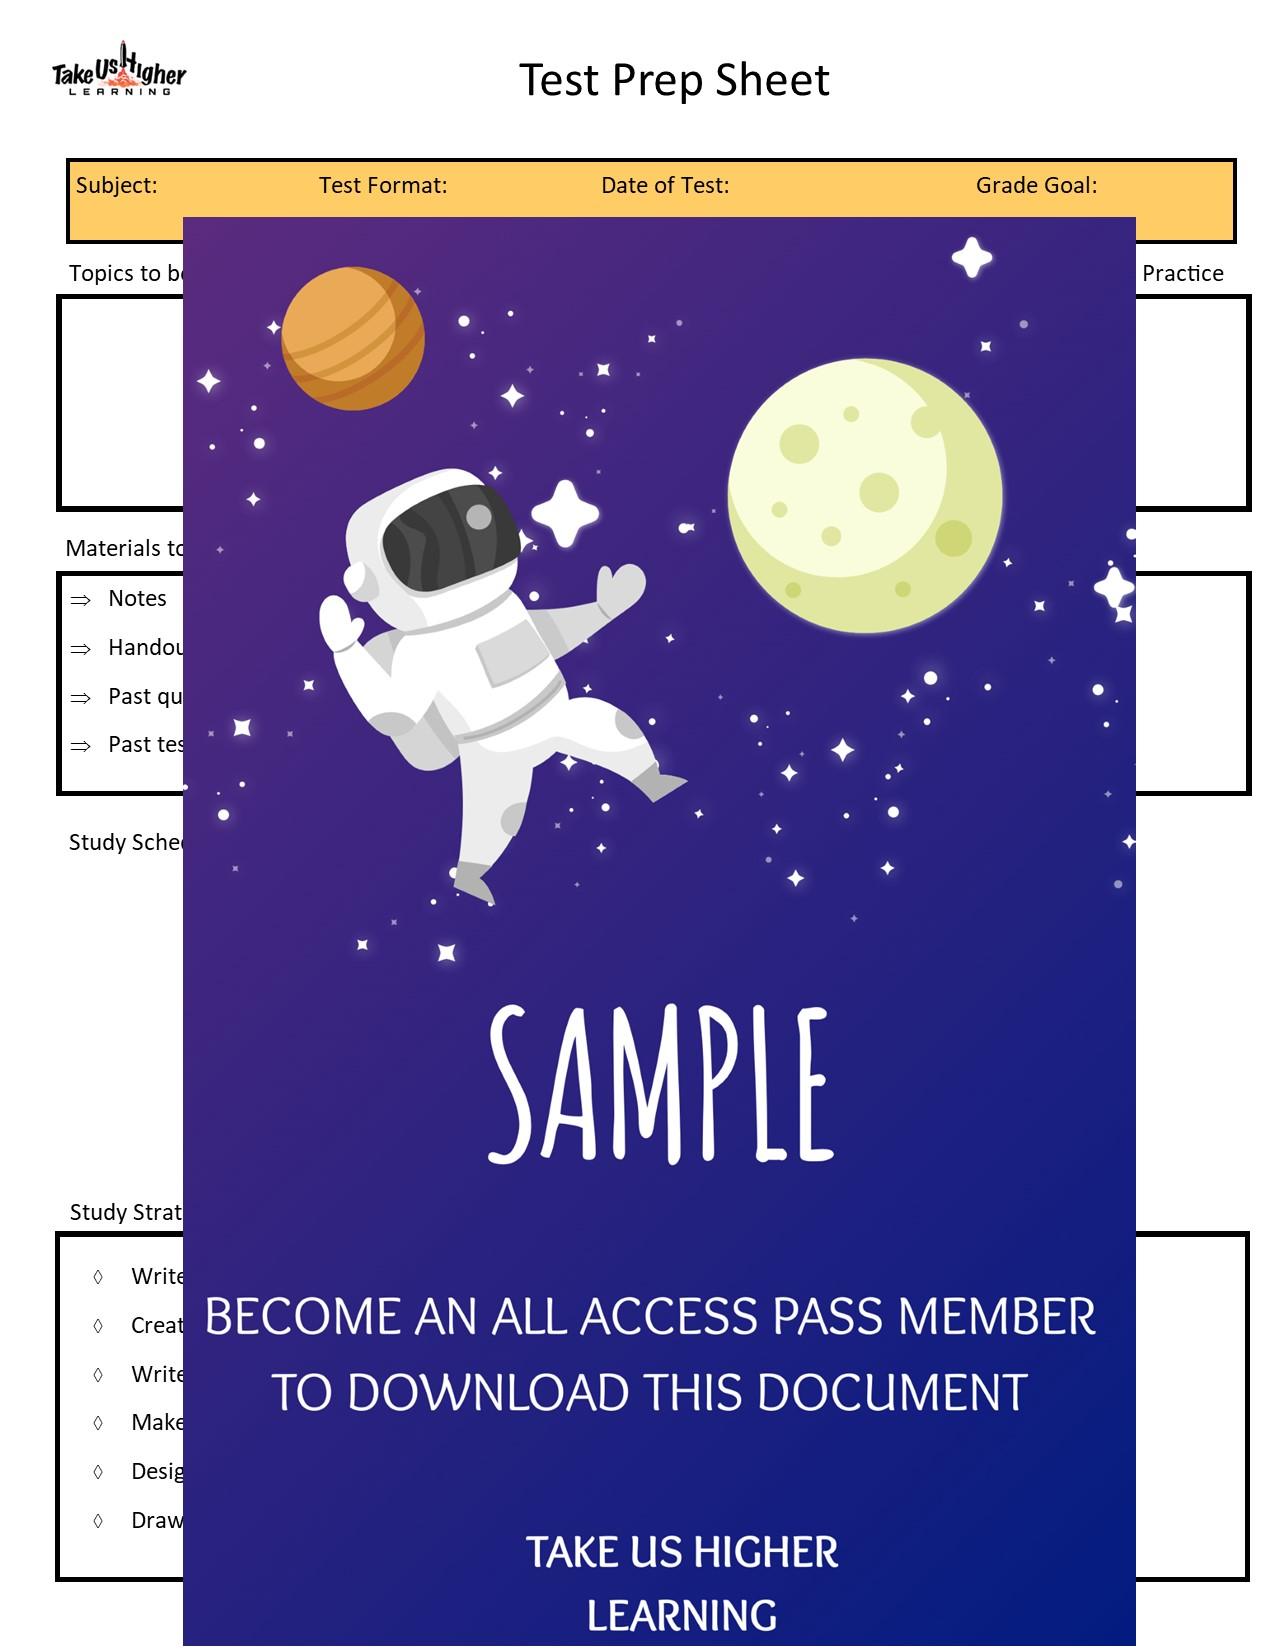 Test Prep Sheet